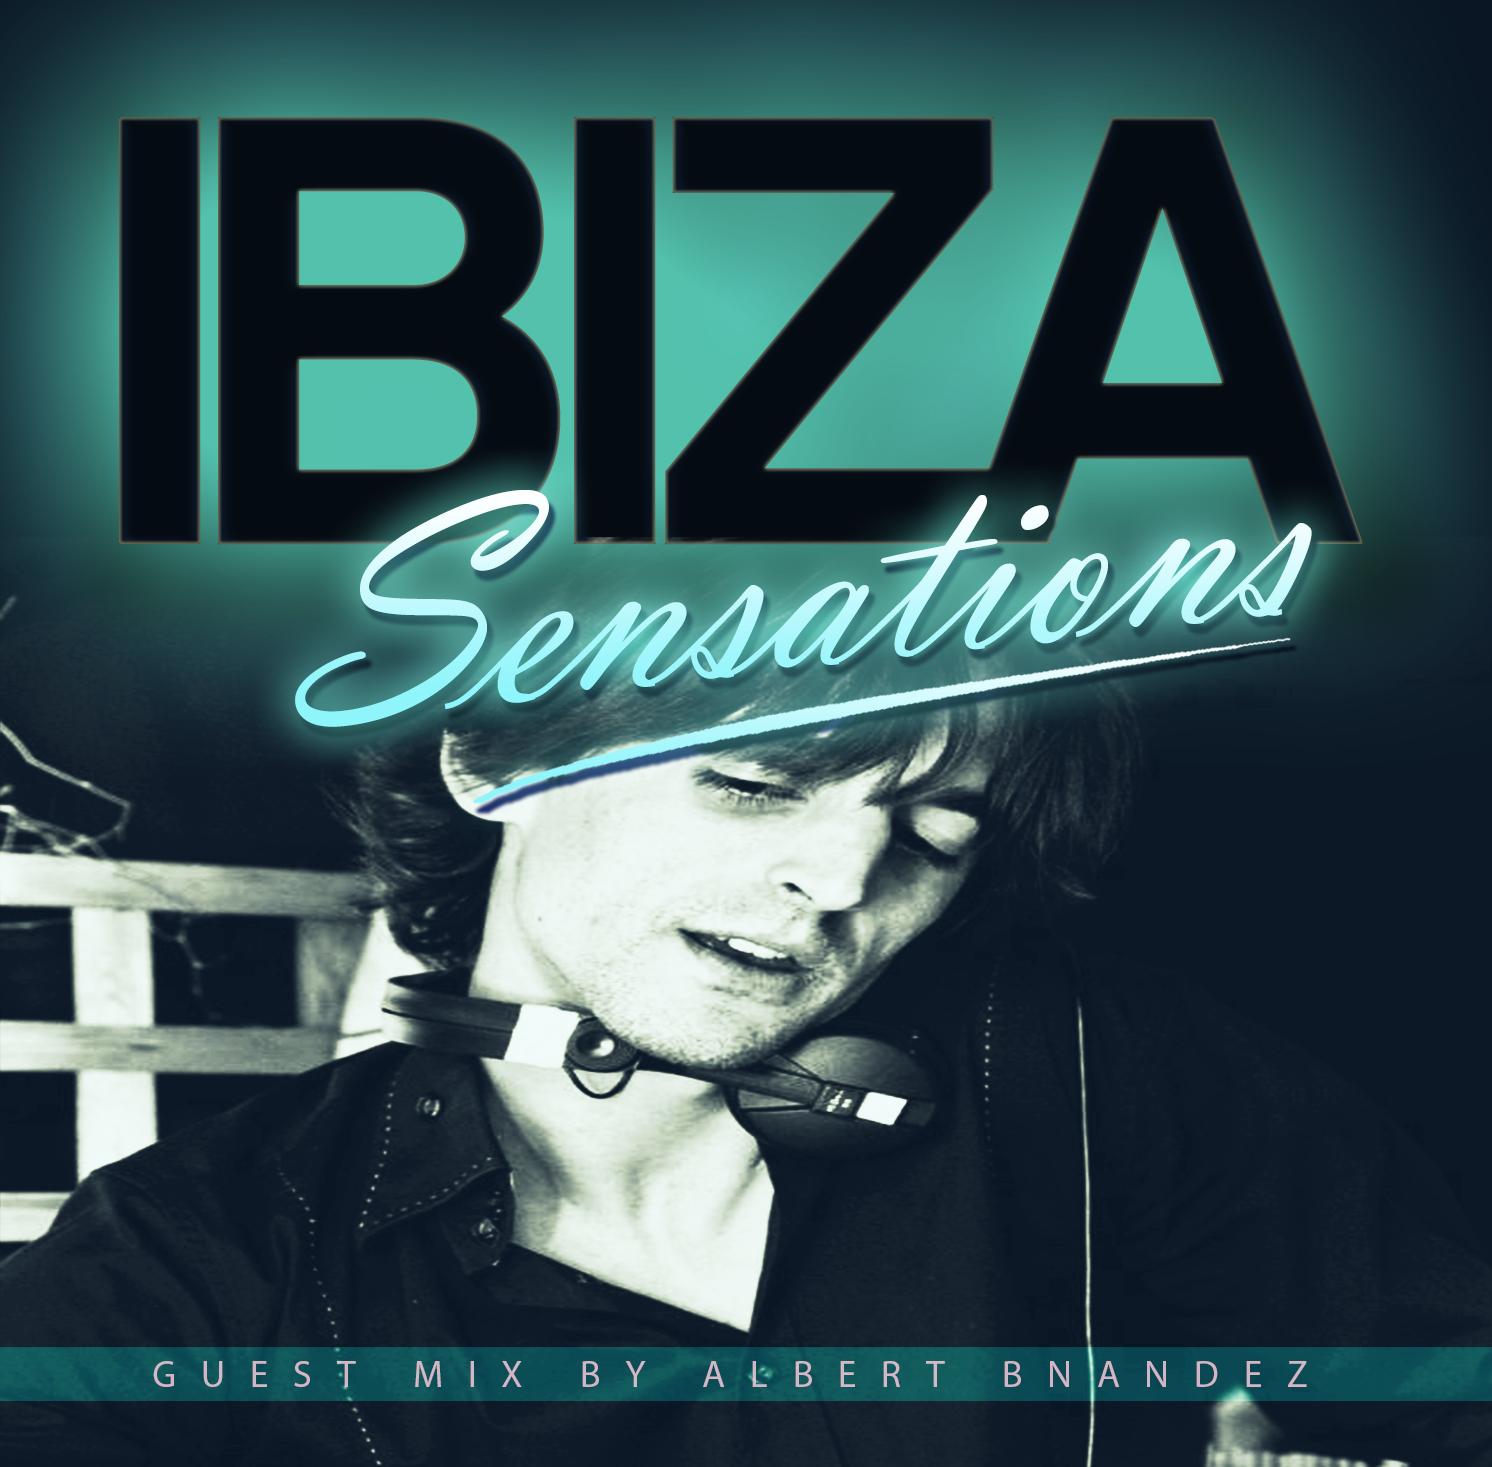 Artwork for Ibiza Sensations 65